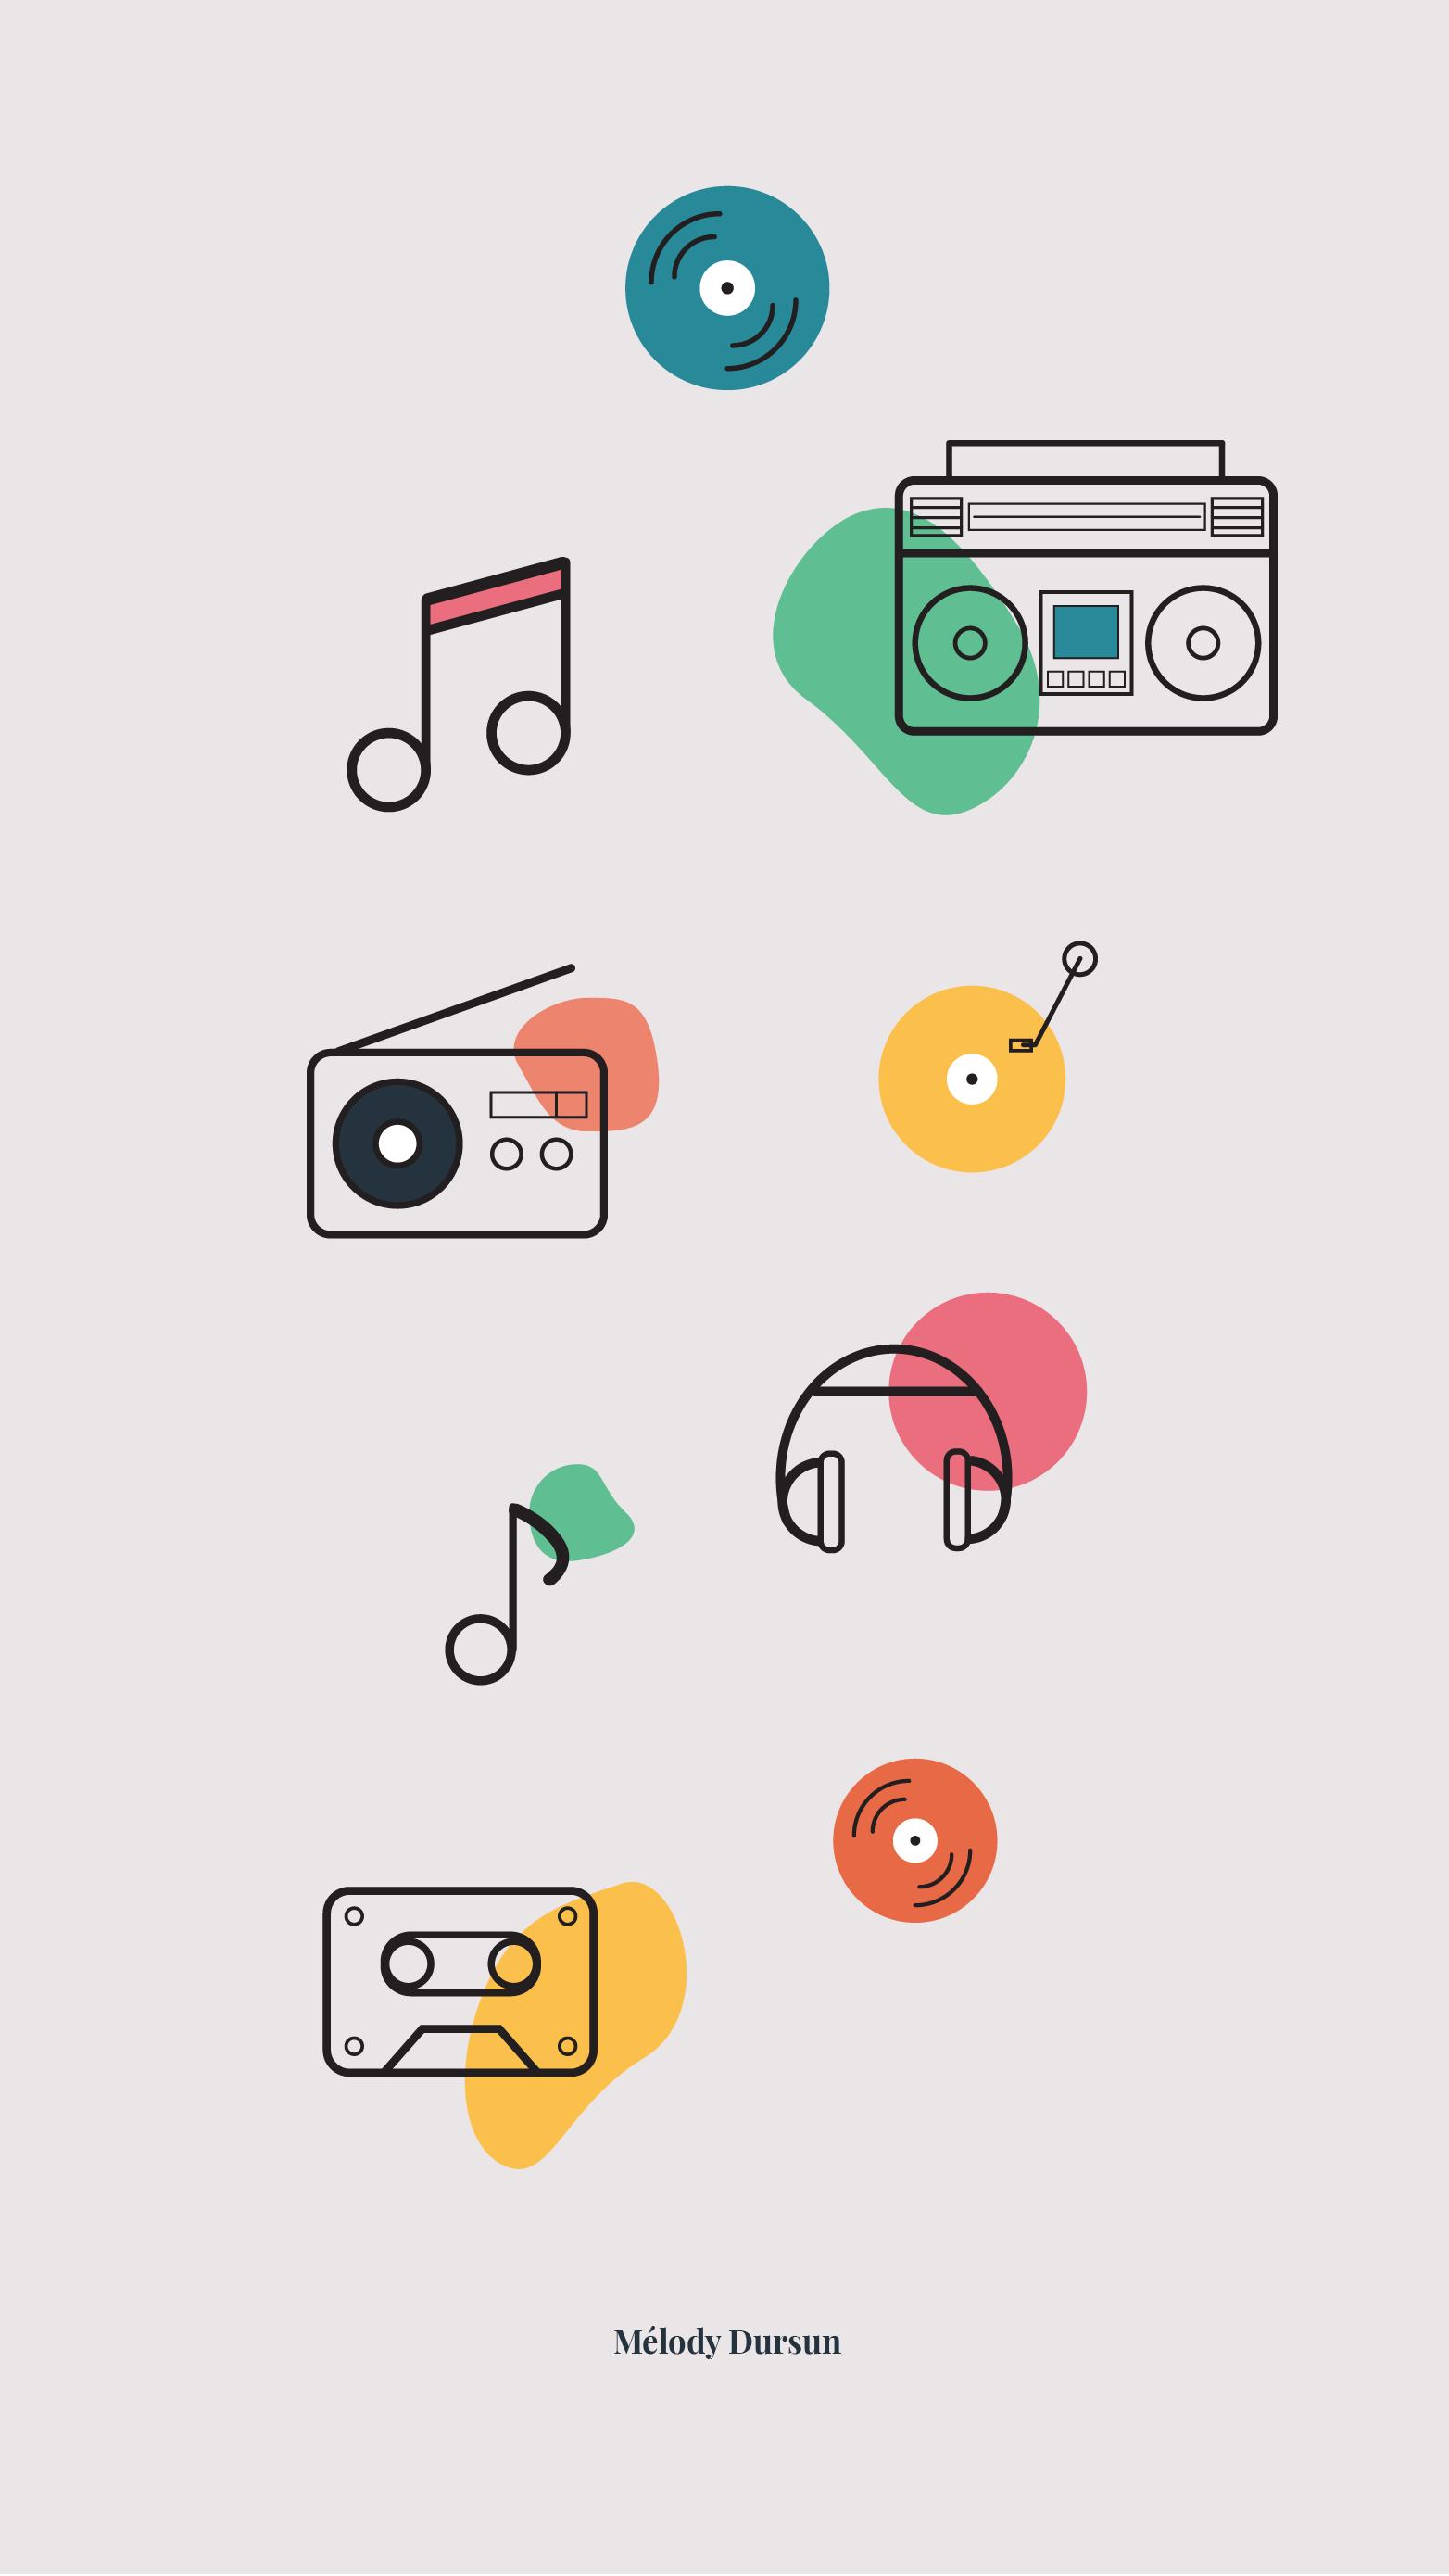 olecoeur-melodydursun-fond-juin2019-iphone6